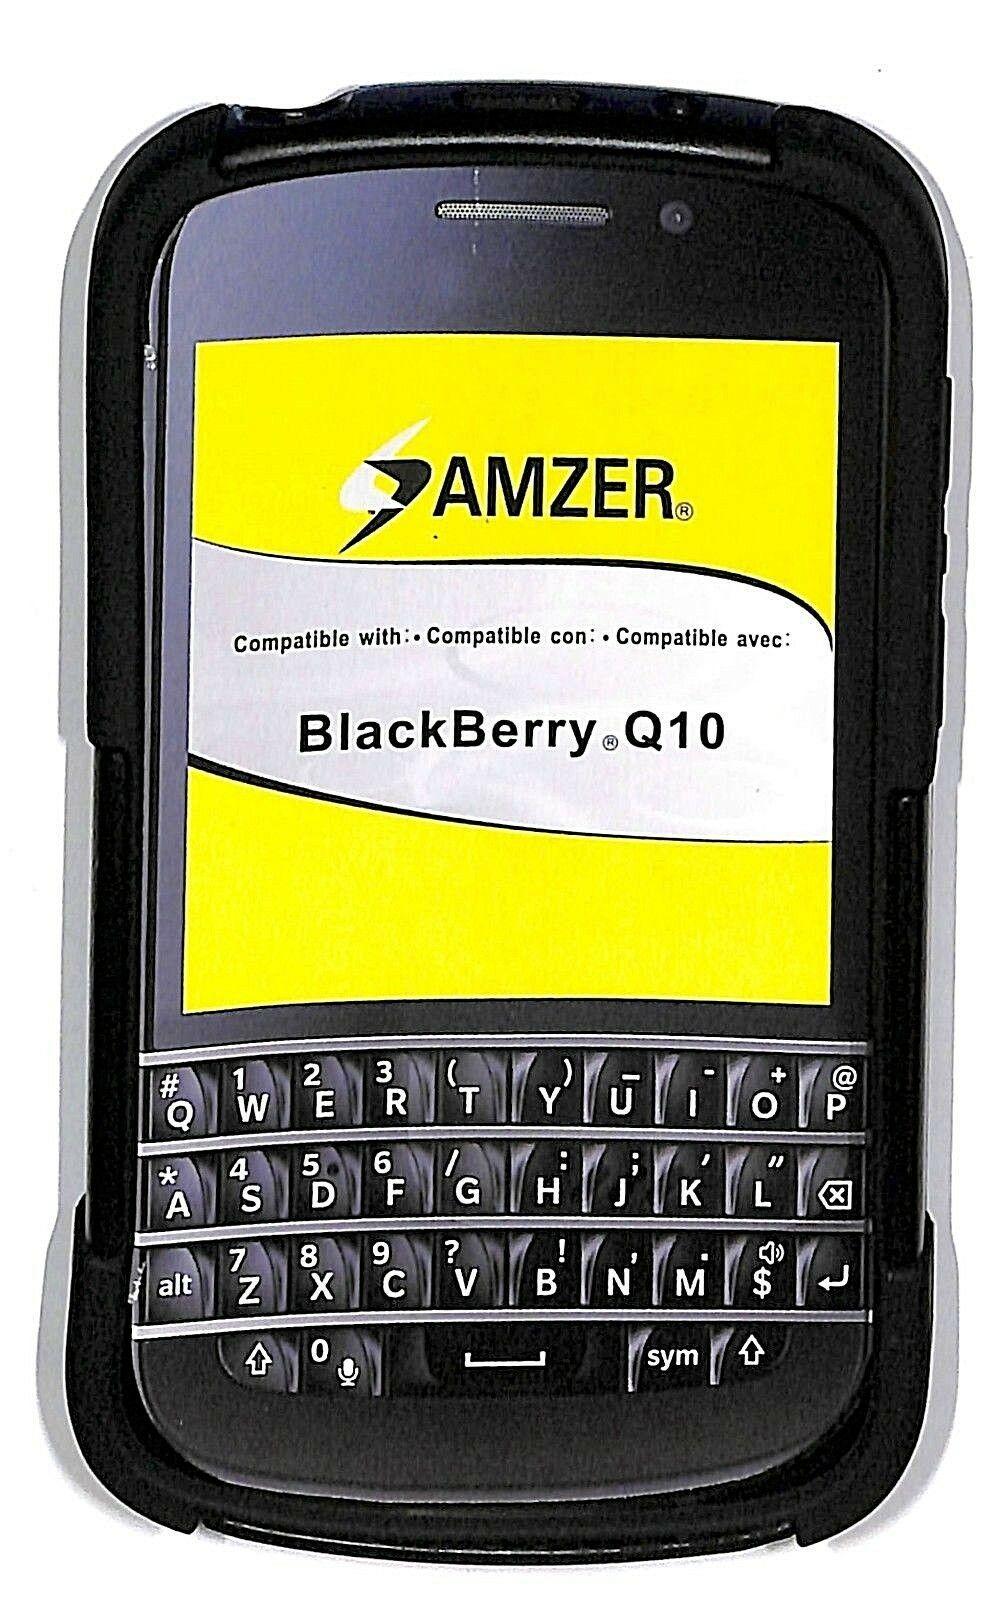 Amzer Hybrid Case Cover kickstand case for Blackberry Q10 - $4.95